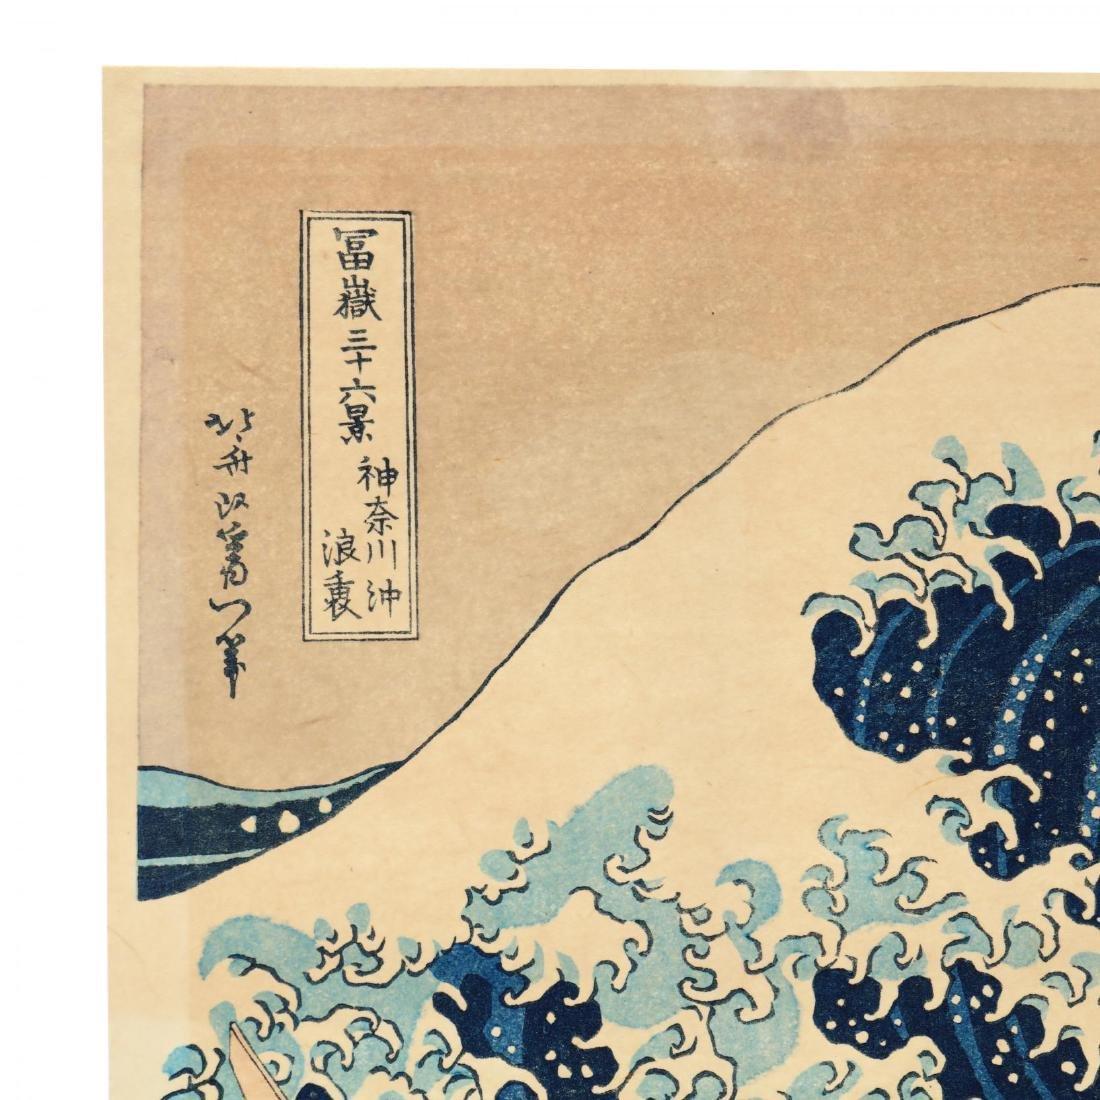 Kanagawa  by Katsushika Hokusai (Japanese, 1760-1849) - 2